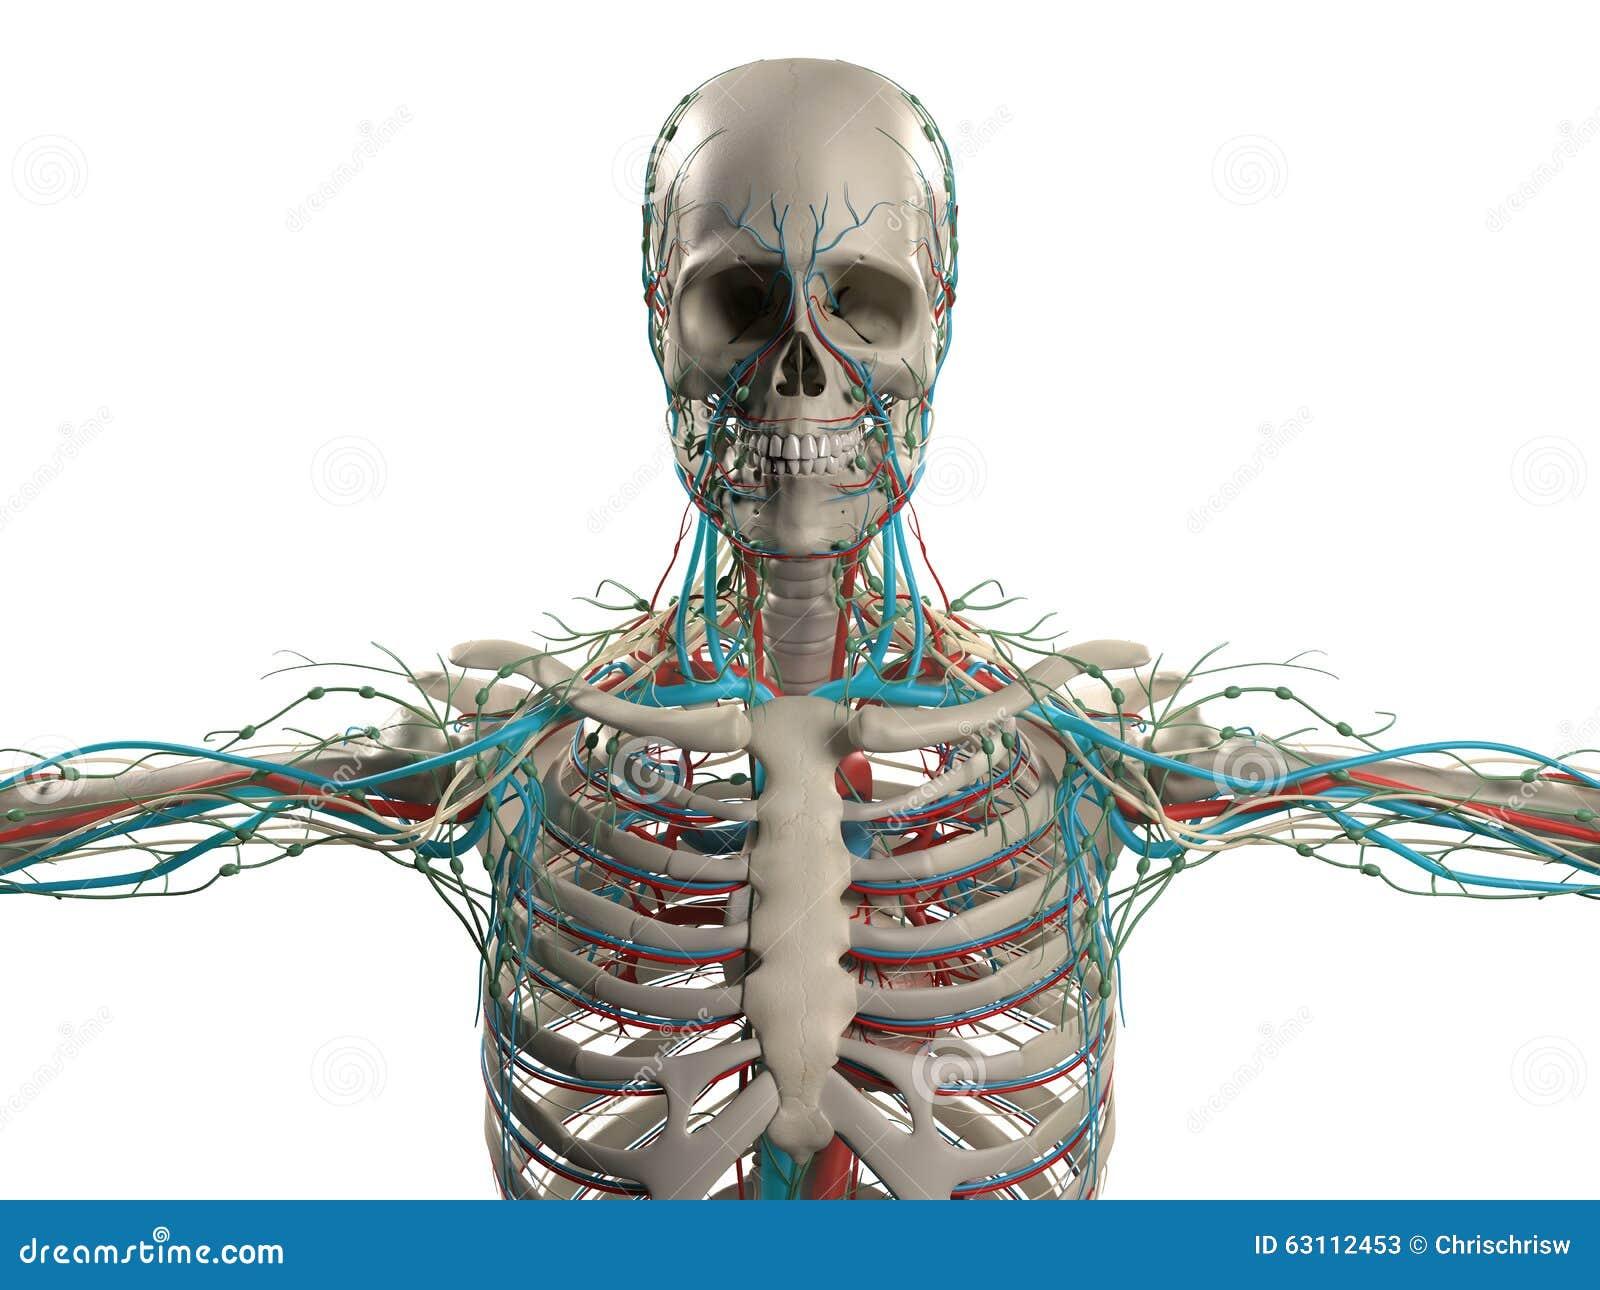 human anatomy showing head, shoulders and torso, bone structure